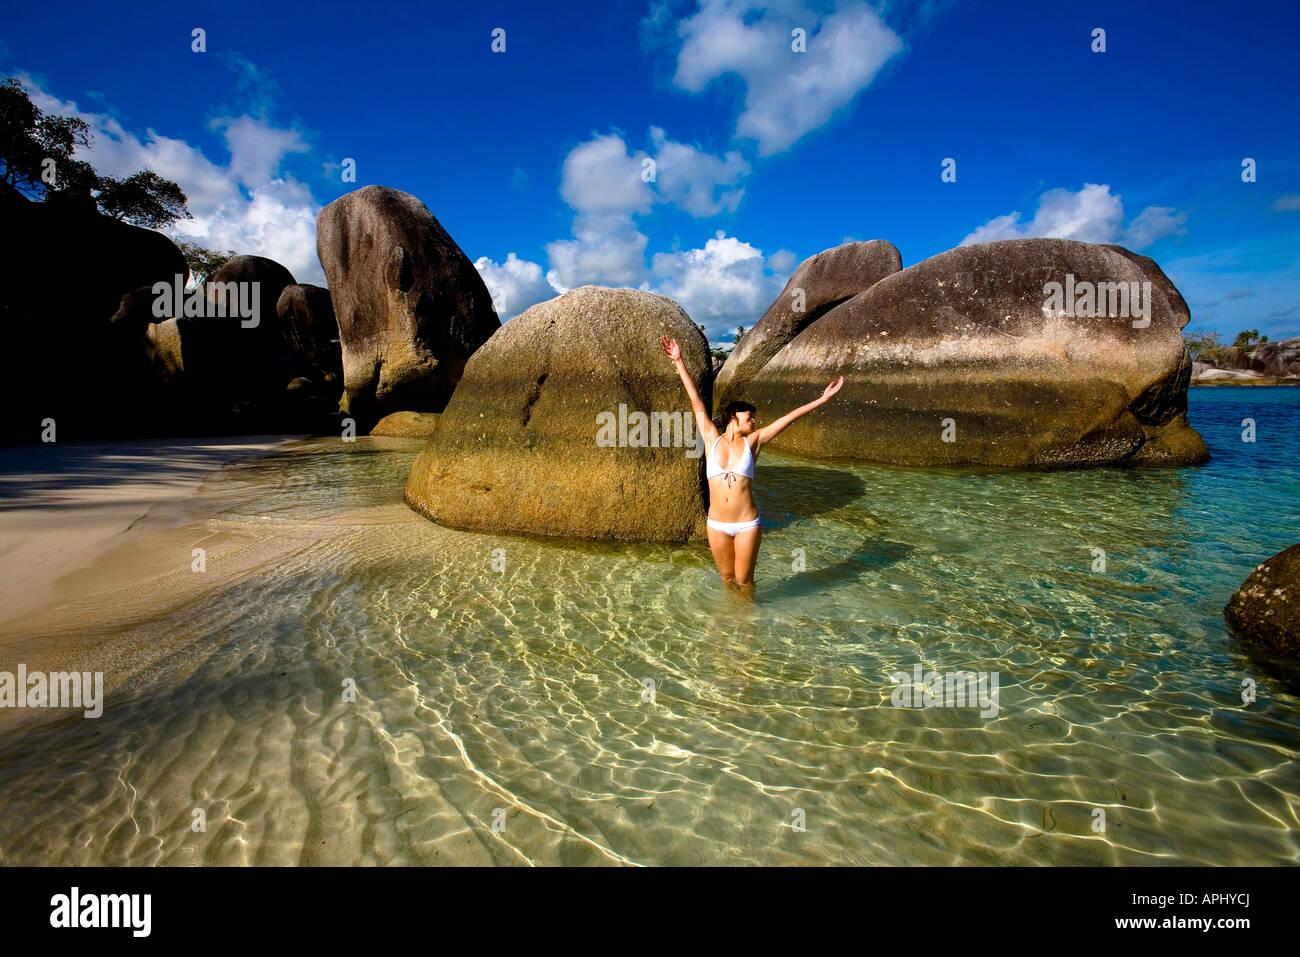 Indonesia, Bangka-Belitung Province, Belitung Island. Stock Photo